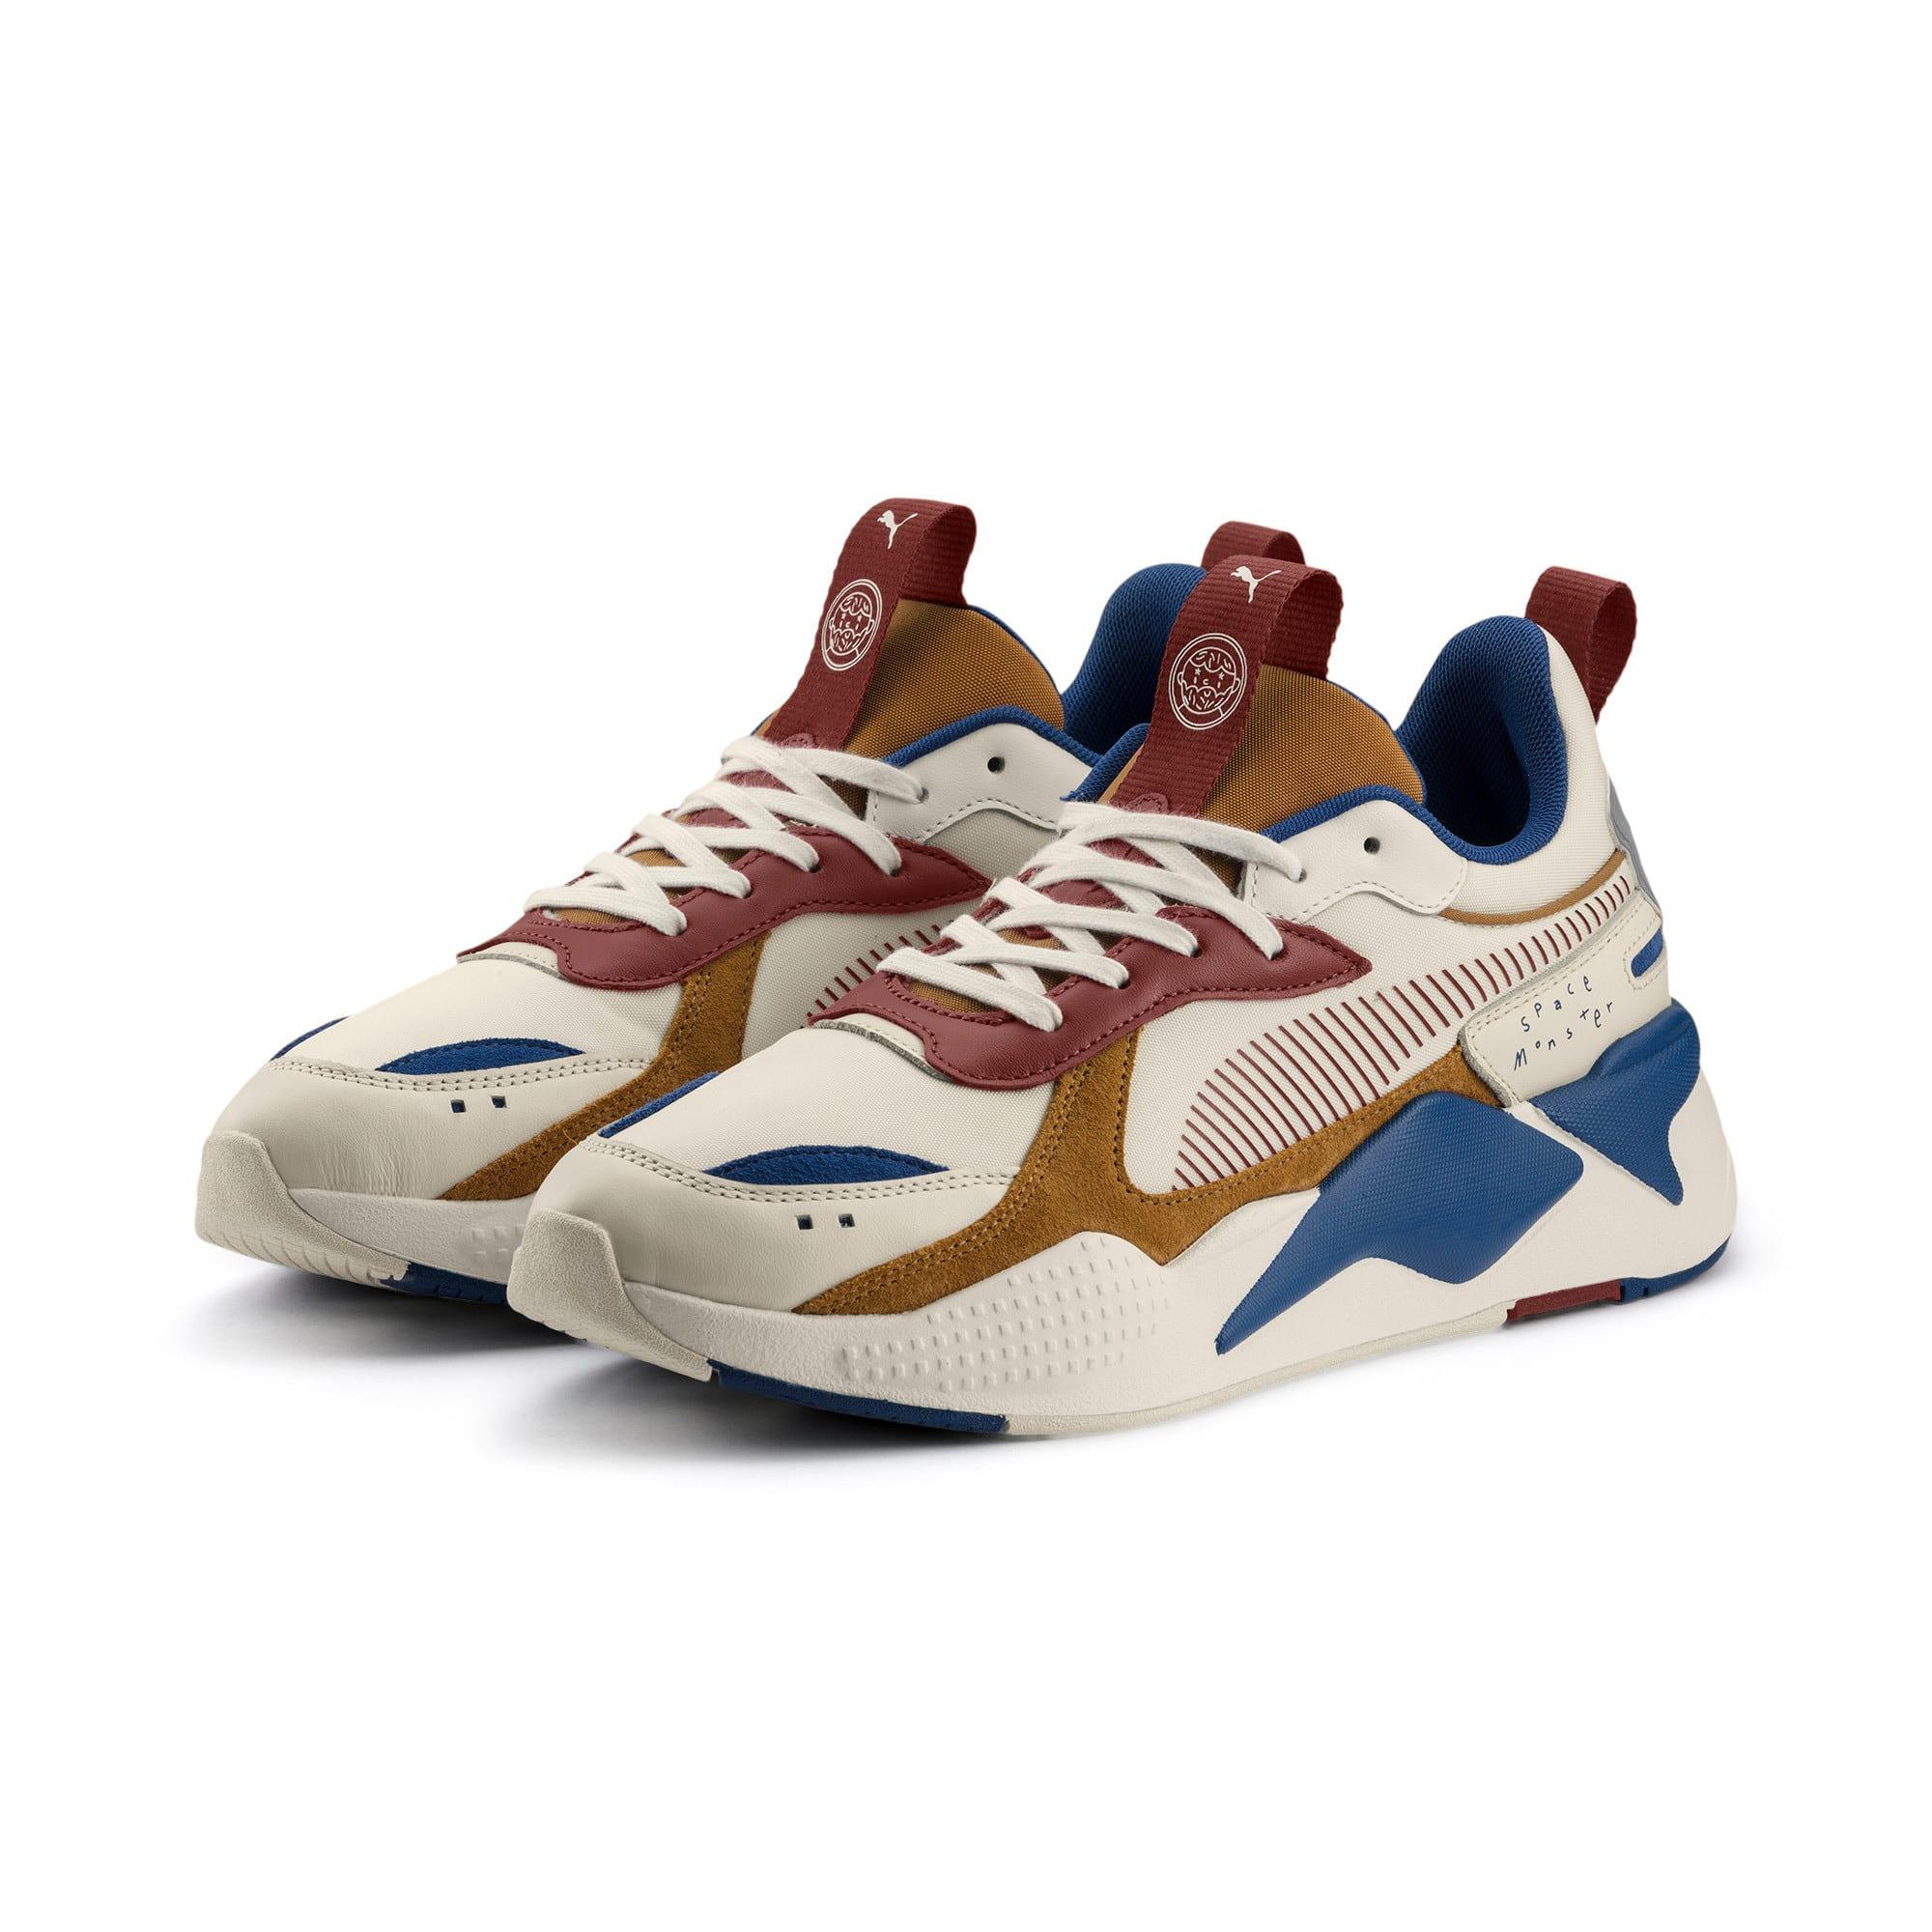 Thumbnail 4 of PUMA x TYAKASHA RS-X Sneakers, Whisper White-Fired Brick, medium